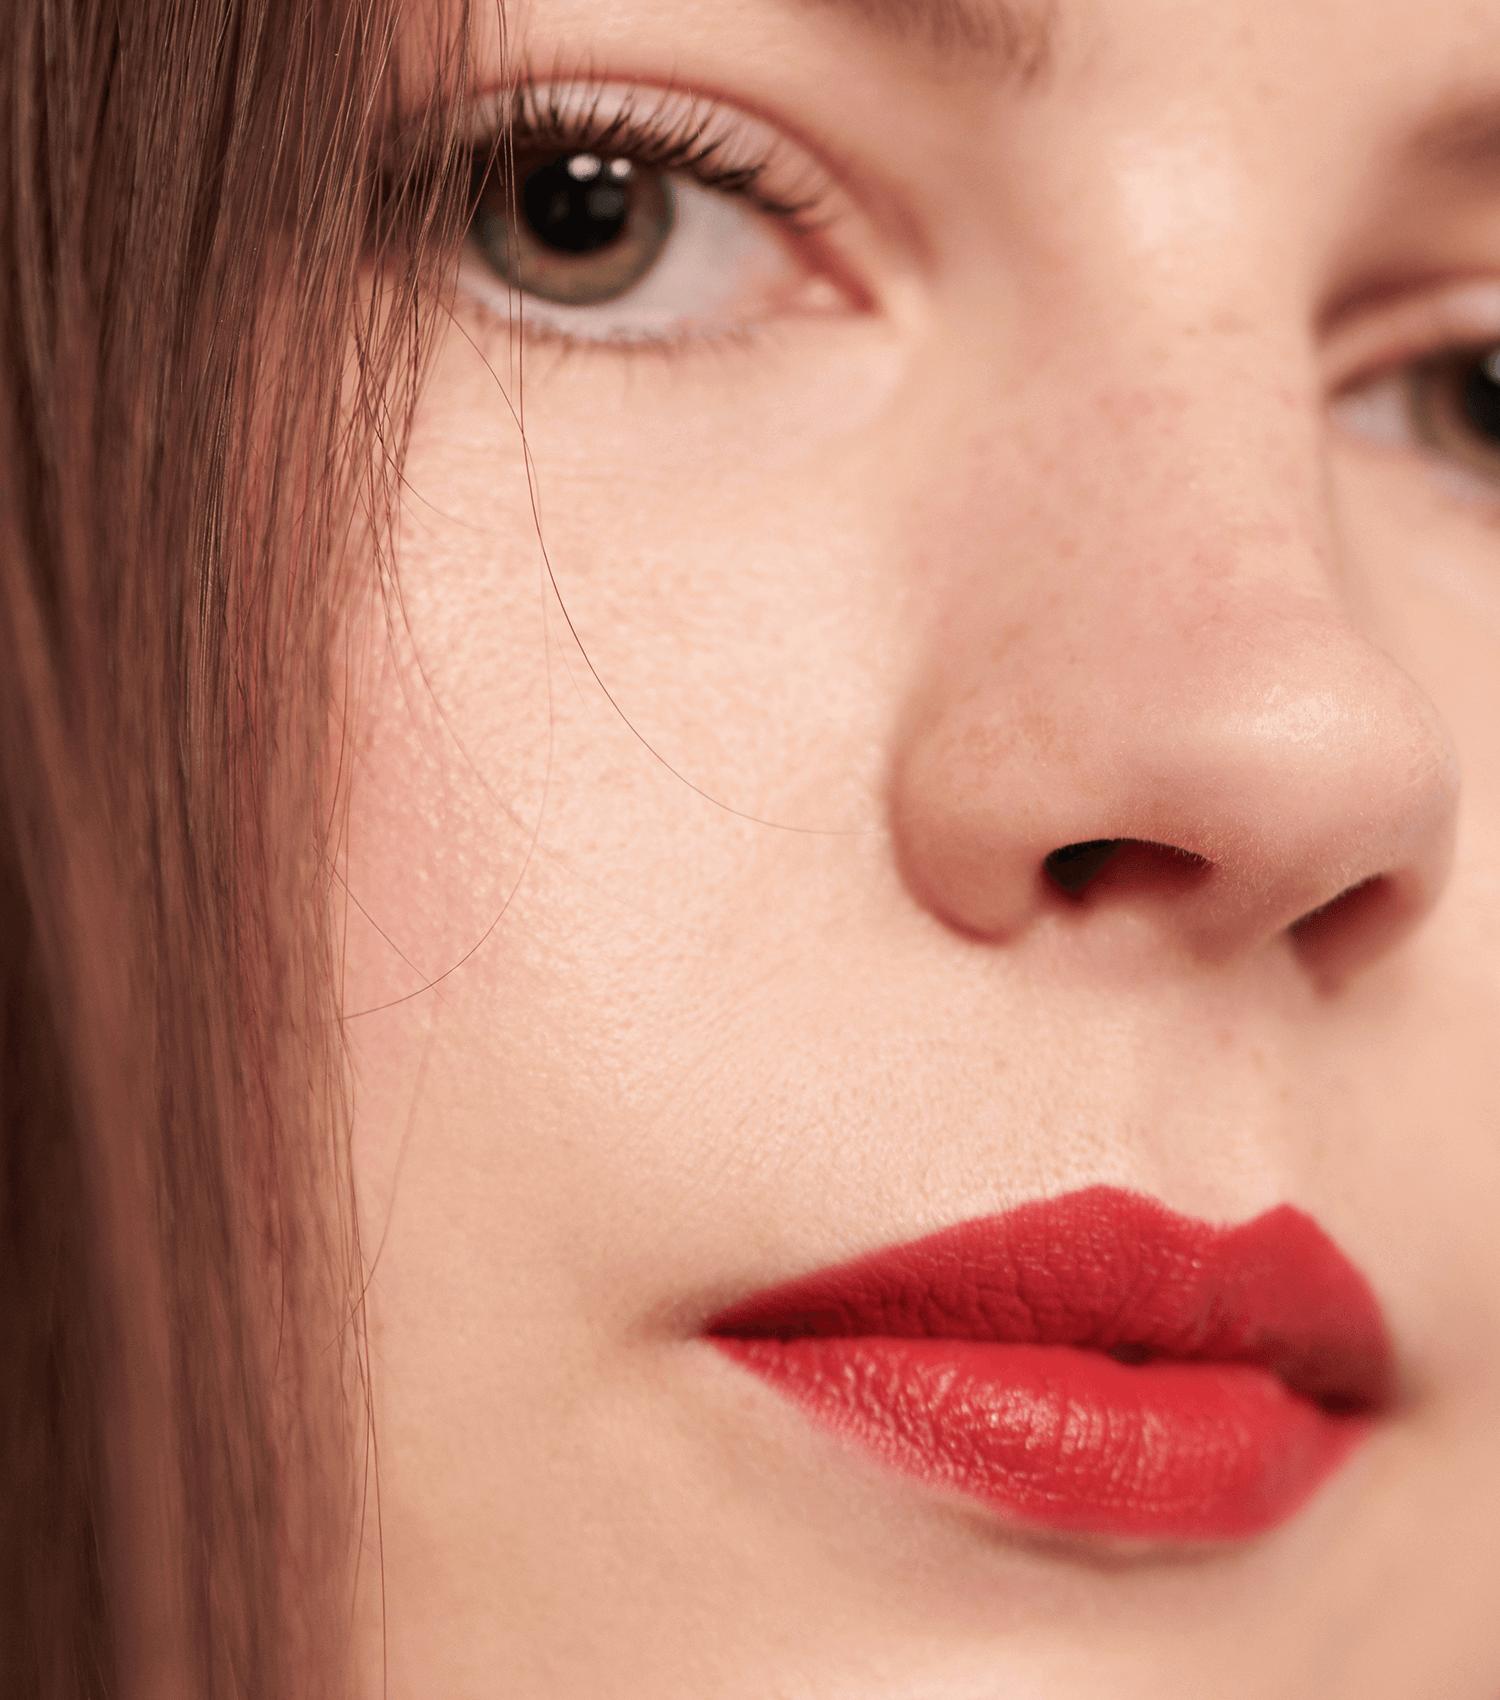 Model wearing red lipstick